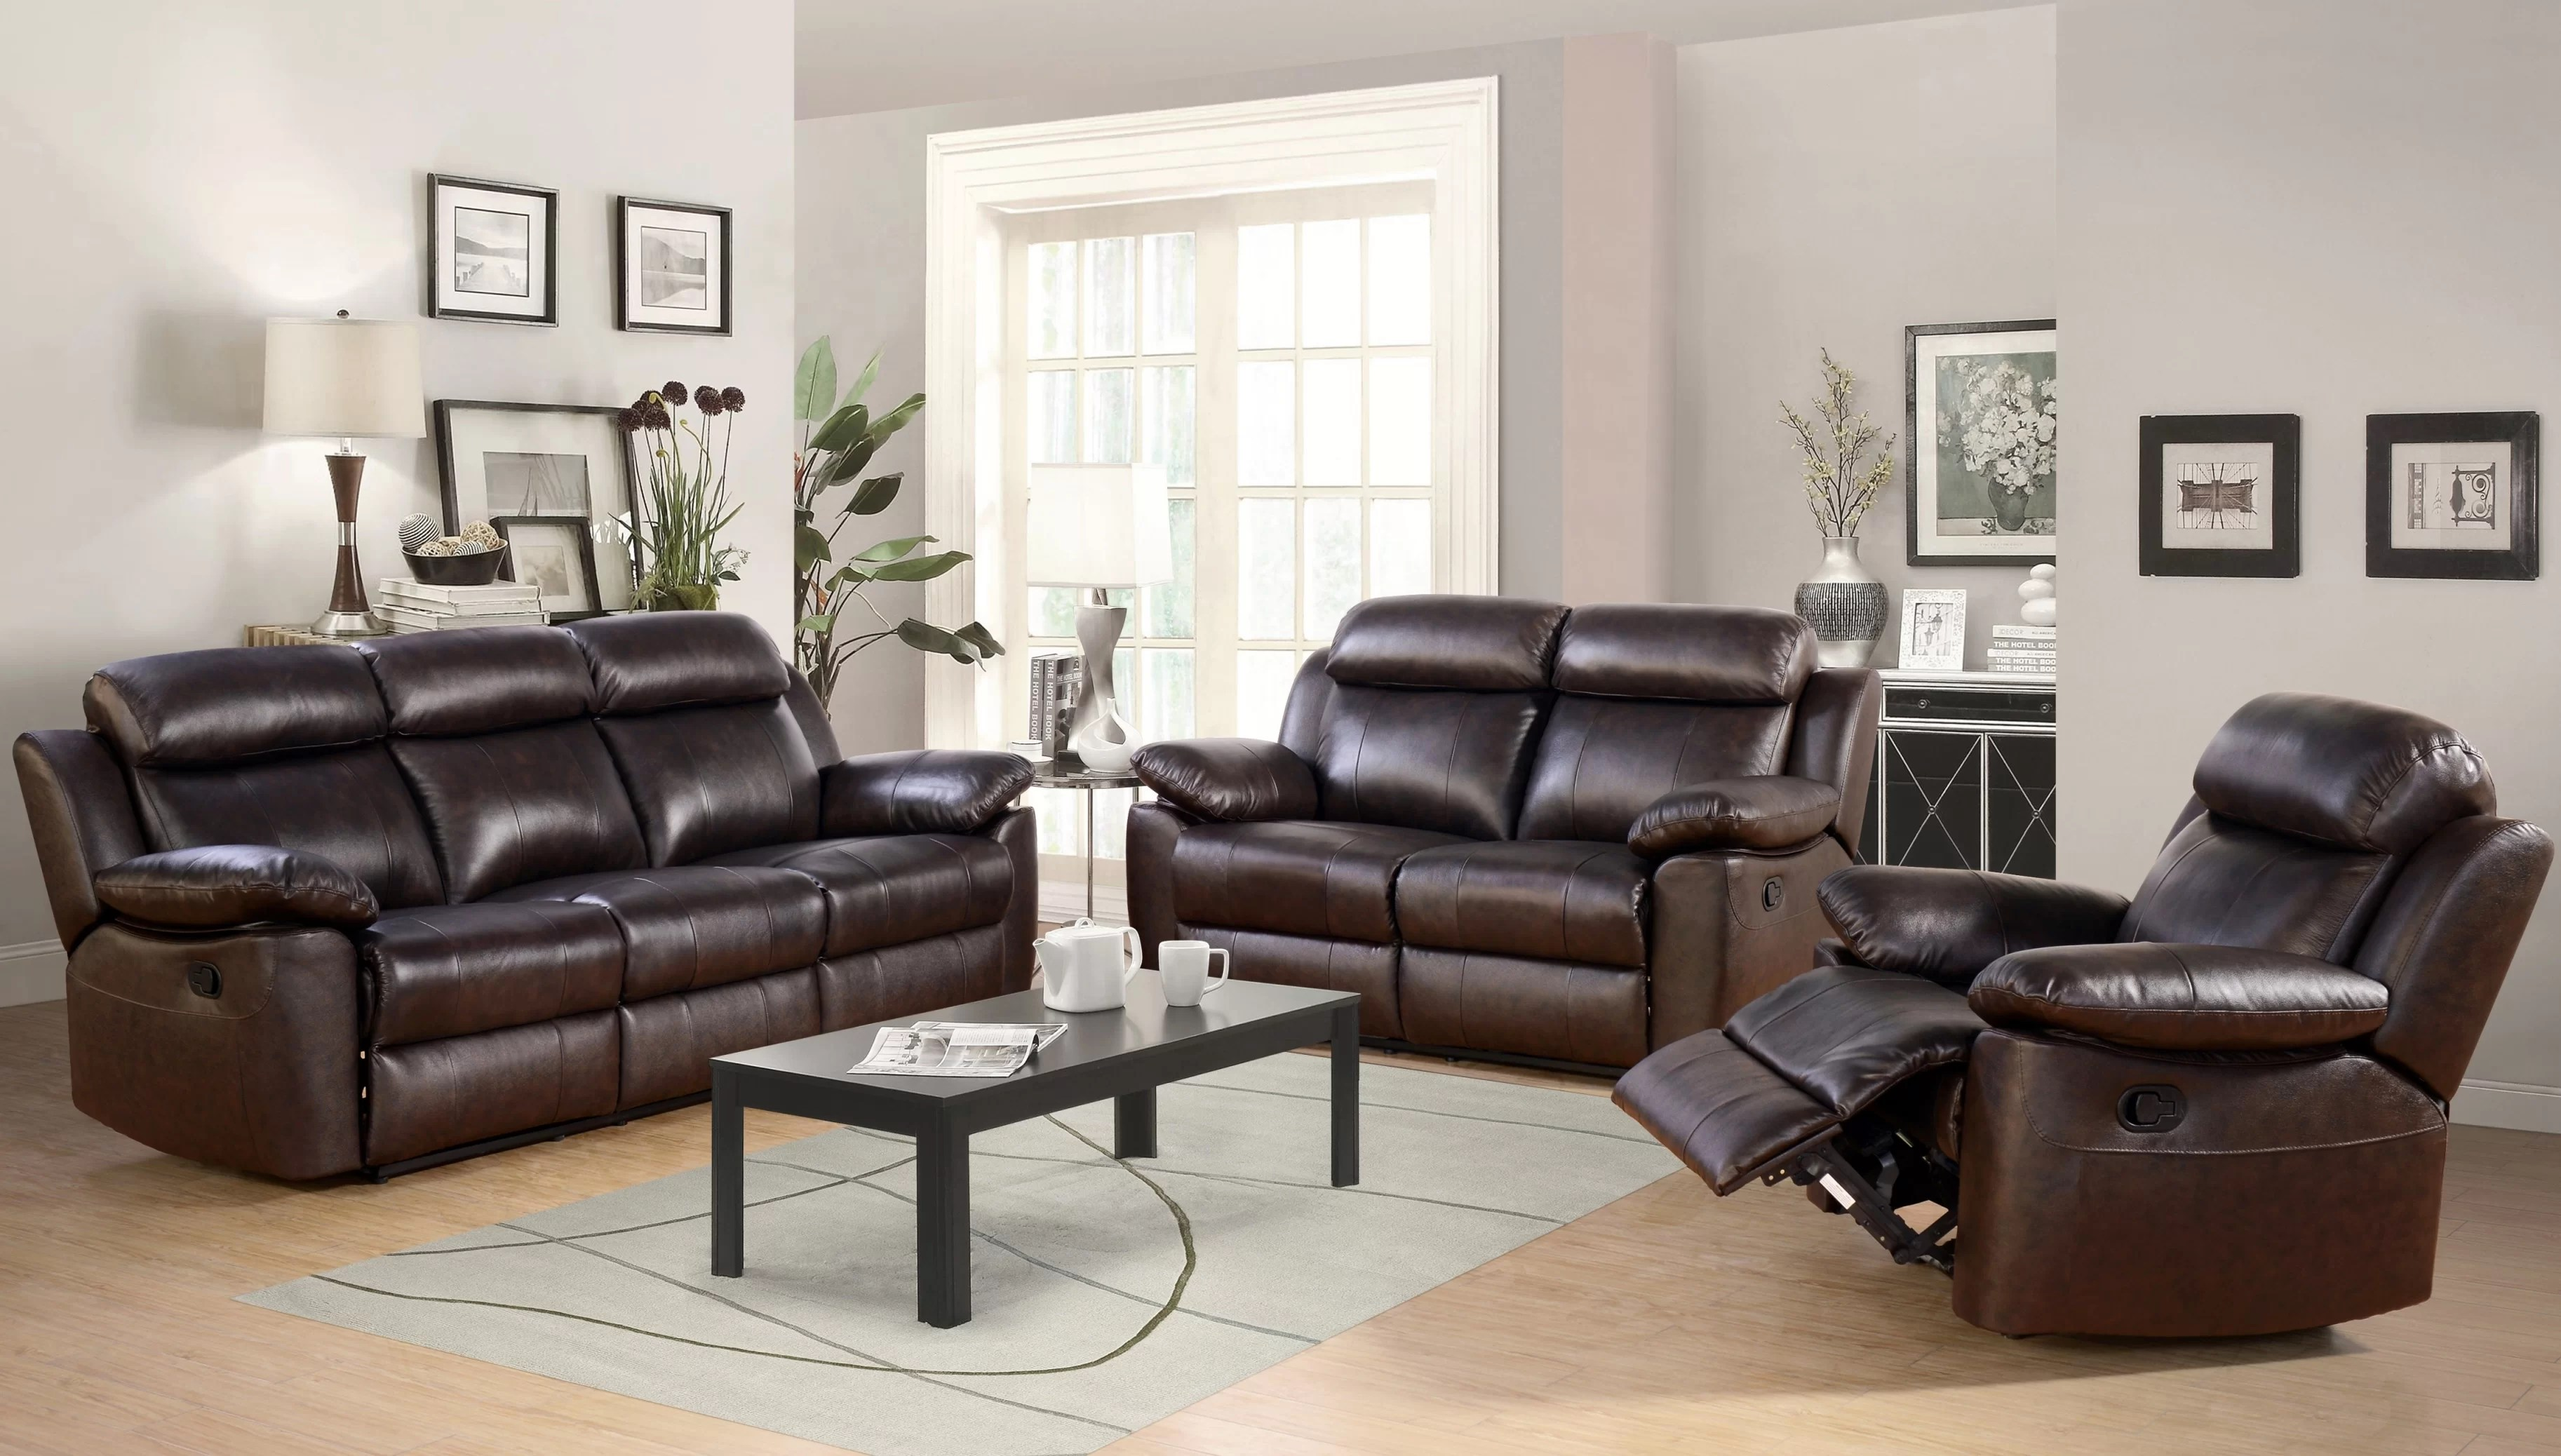 reclining leather living room furniture sets orange painted walls breakwater bay oliver 3 piece set wayfair ca